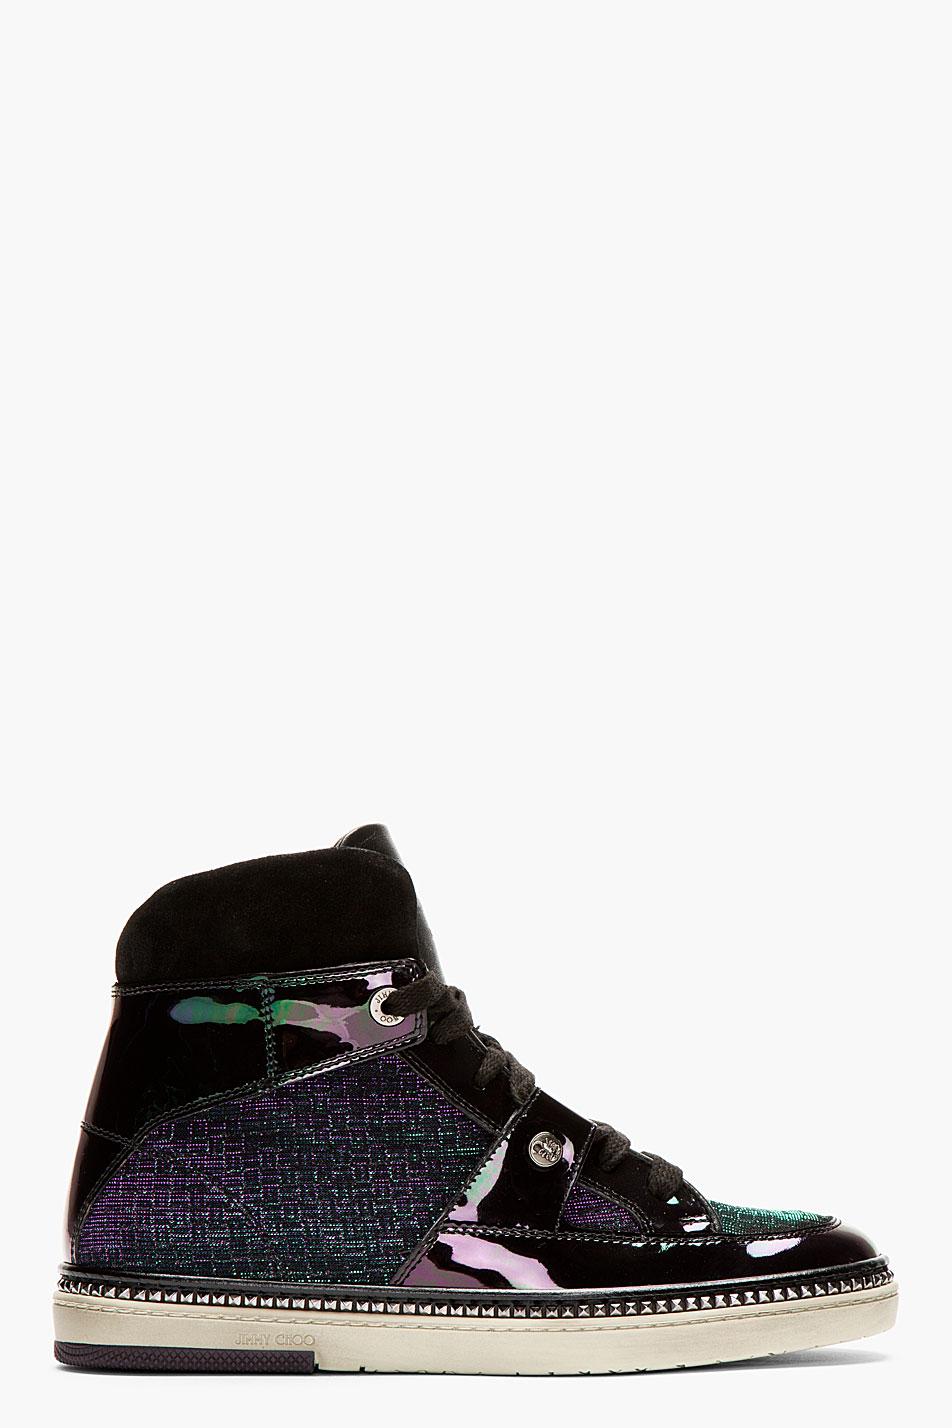 Jimmy Choo Black Iridescent Petrol High-Top Sneakers 1